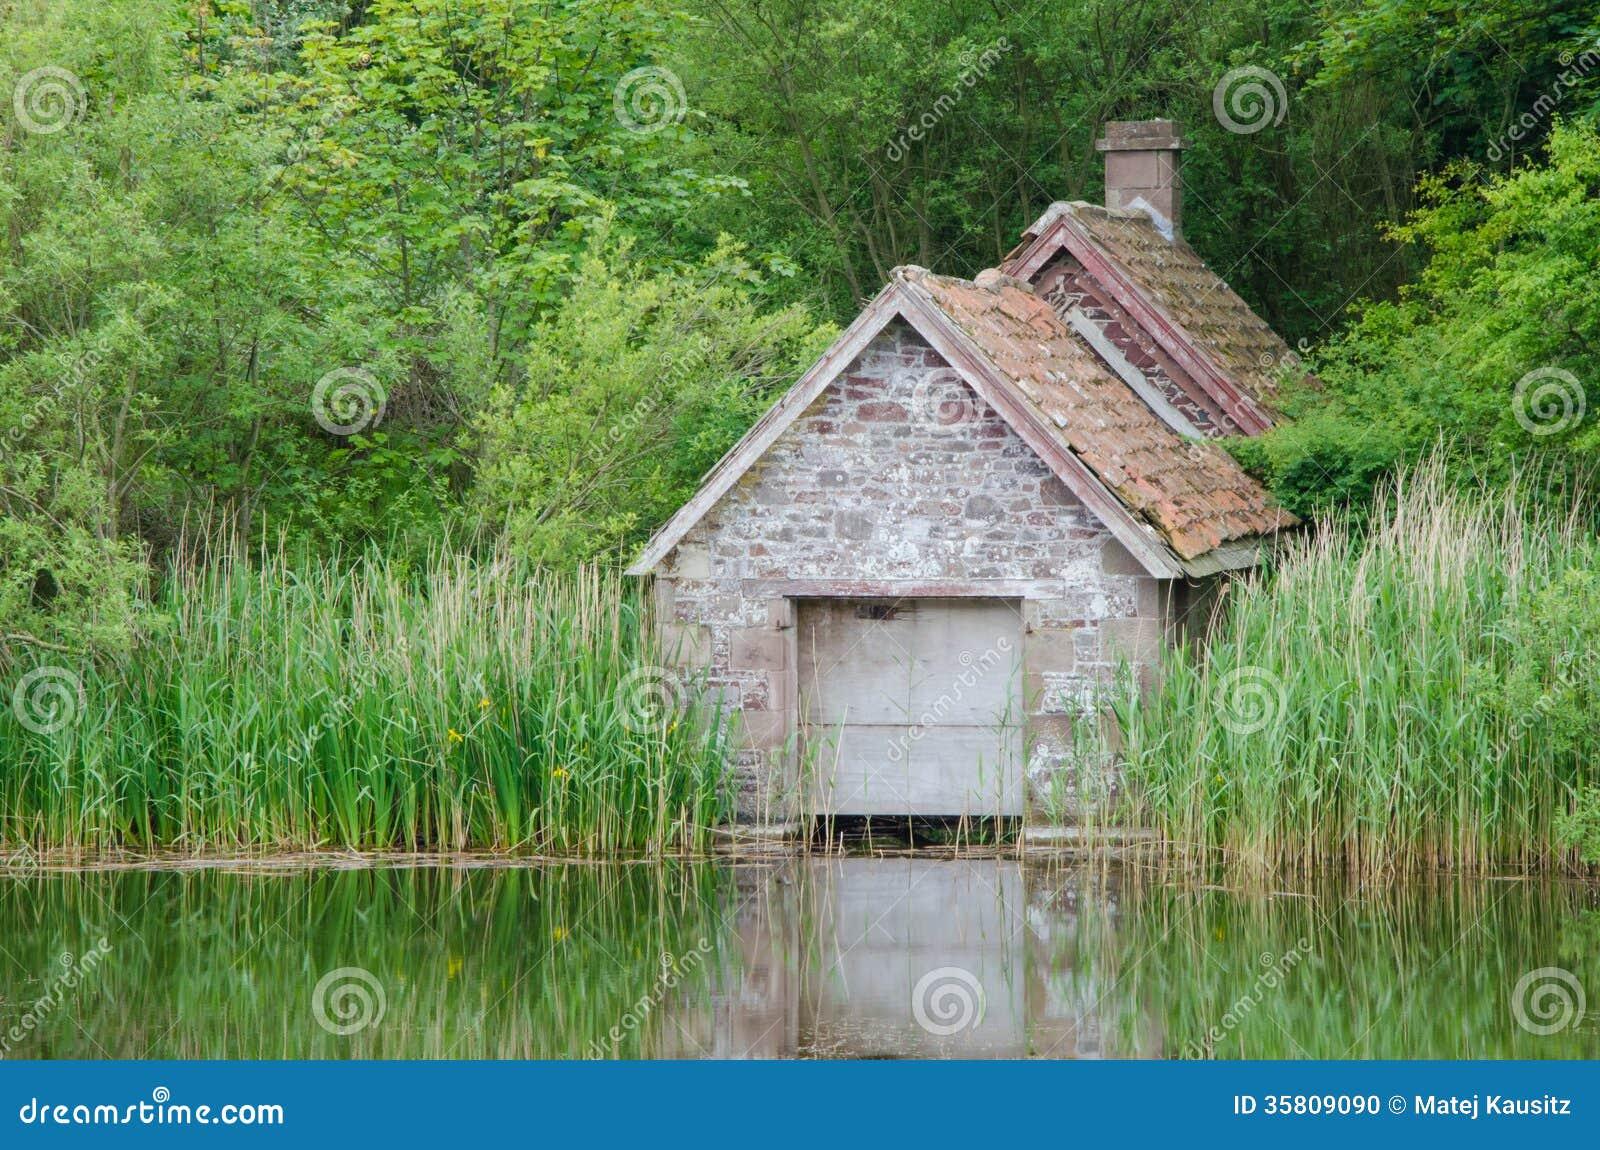 price waterhouse business plan